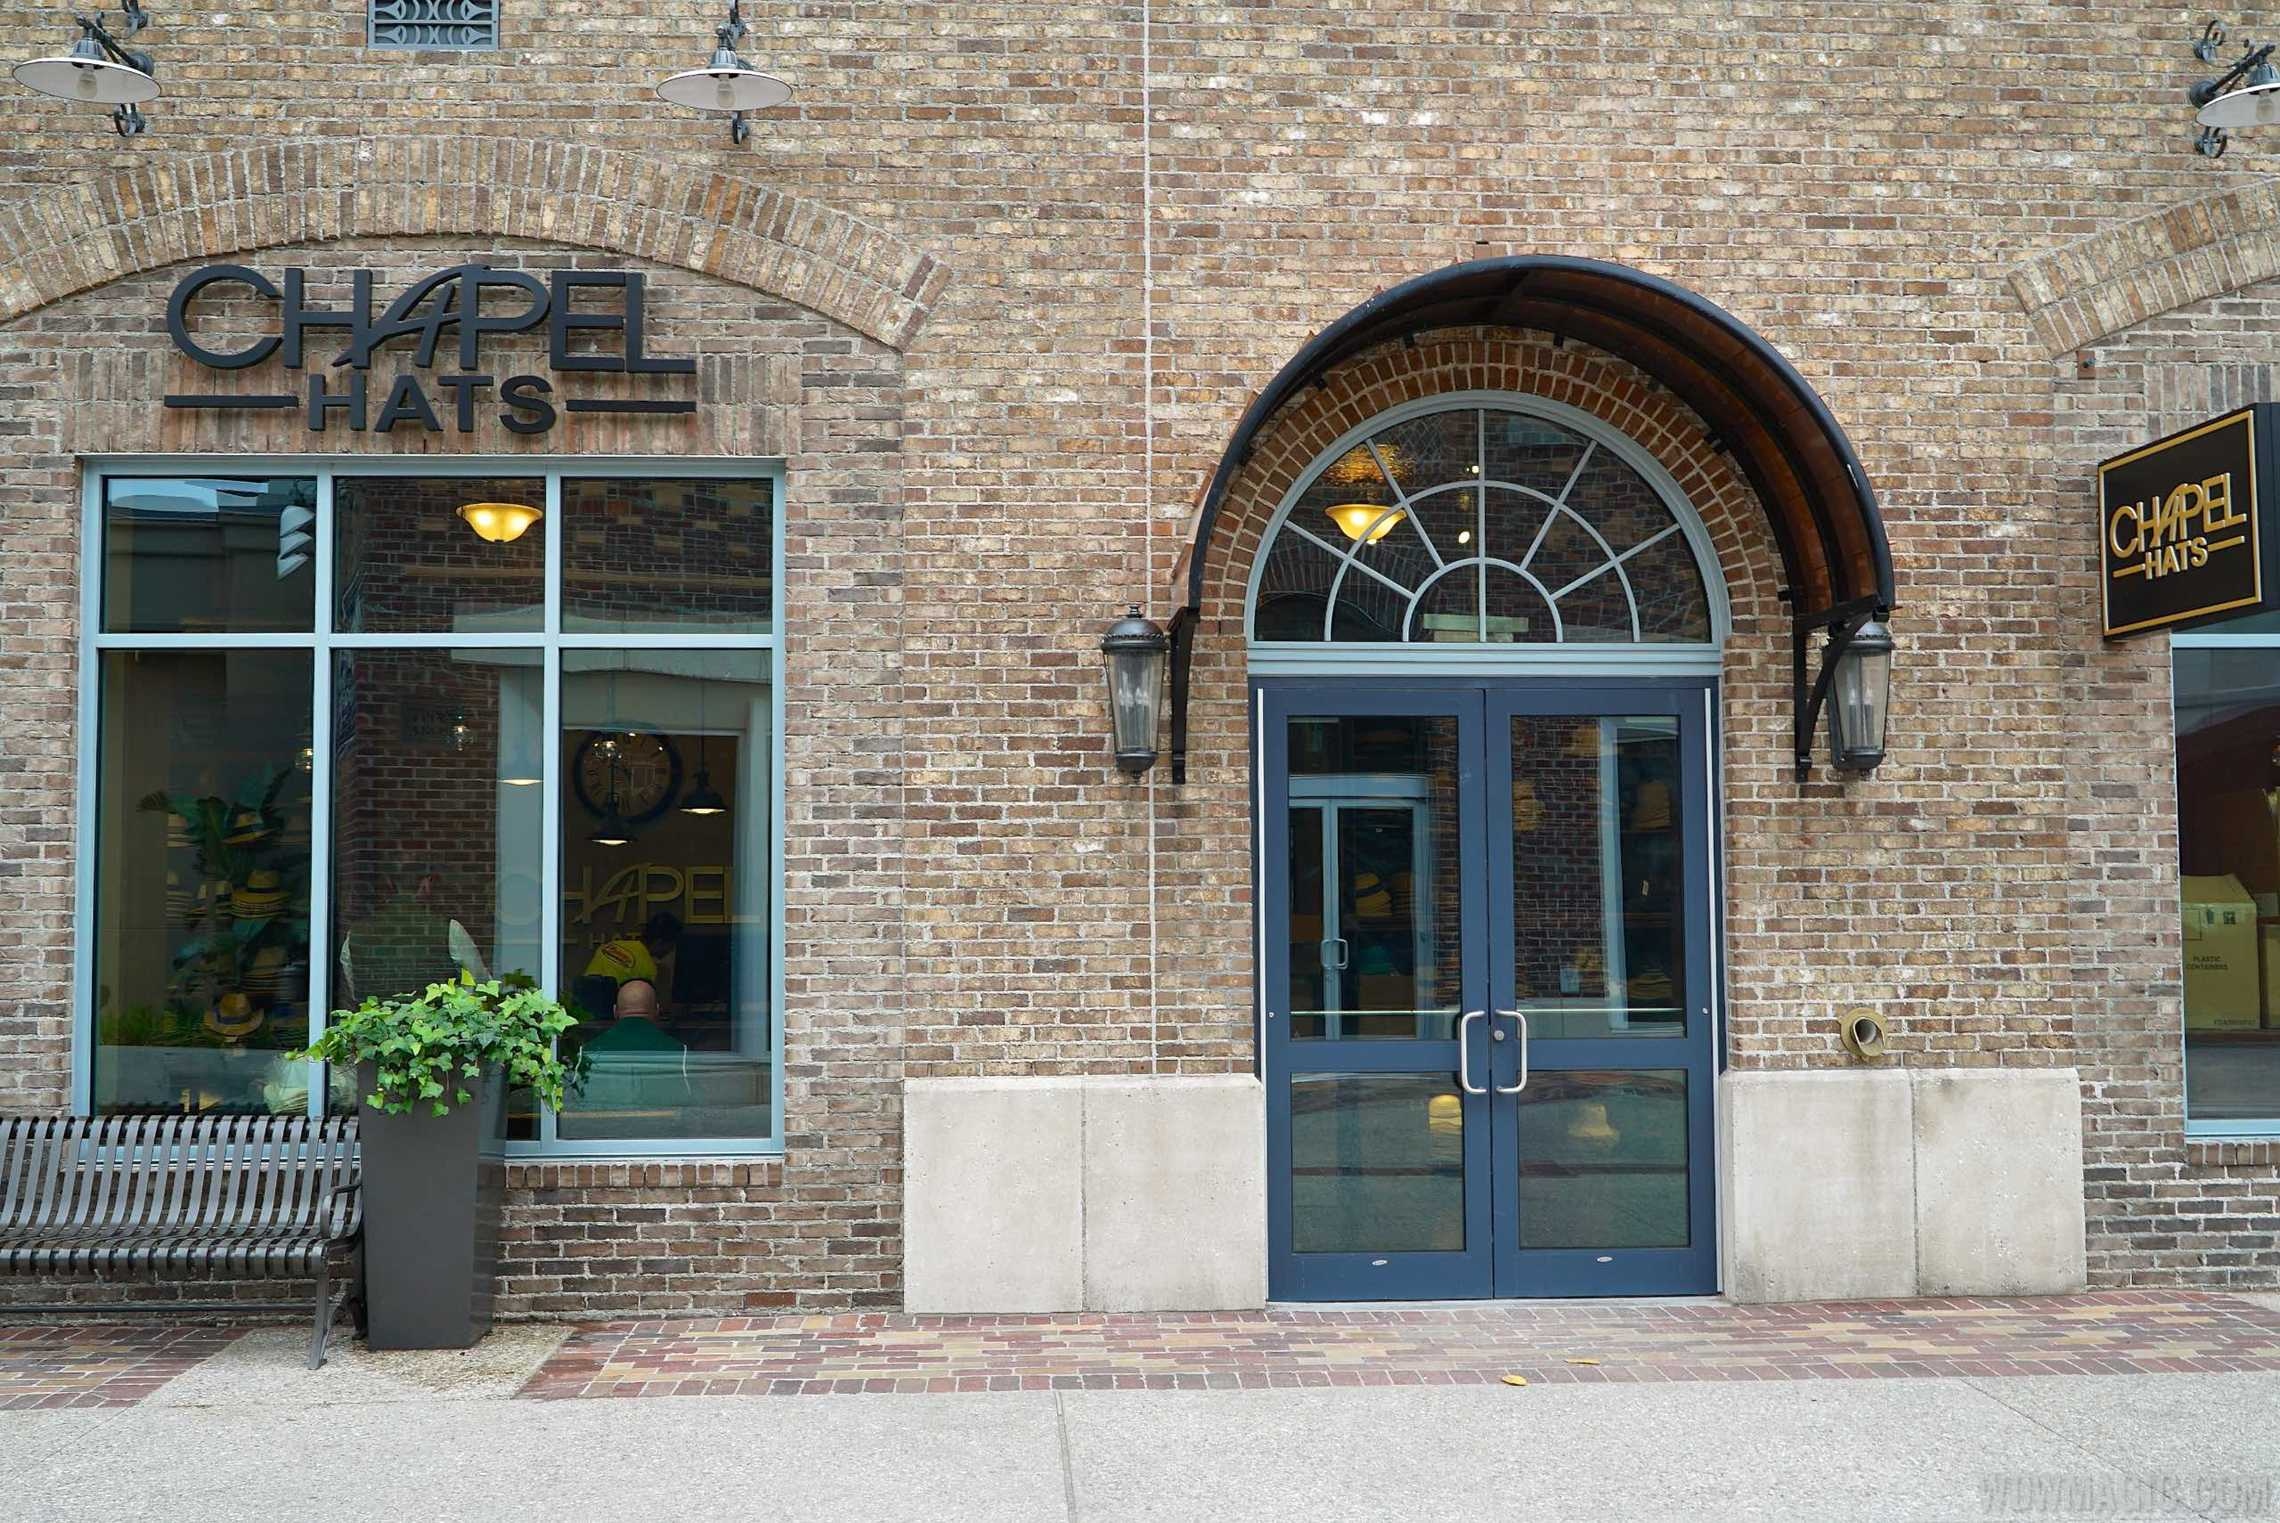 Chapel Hats store front